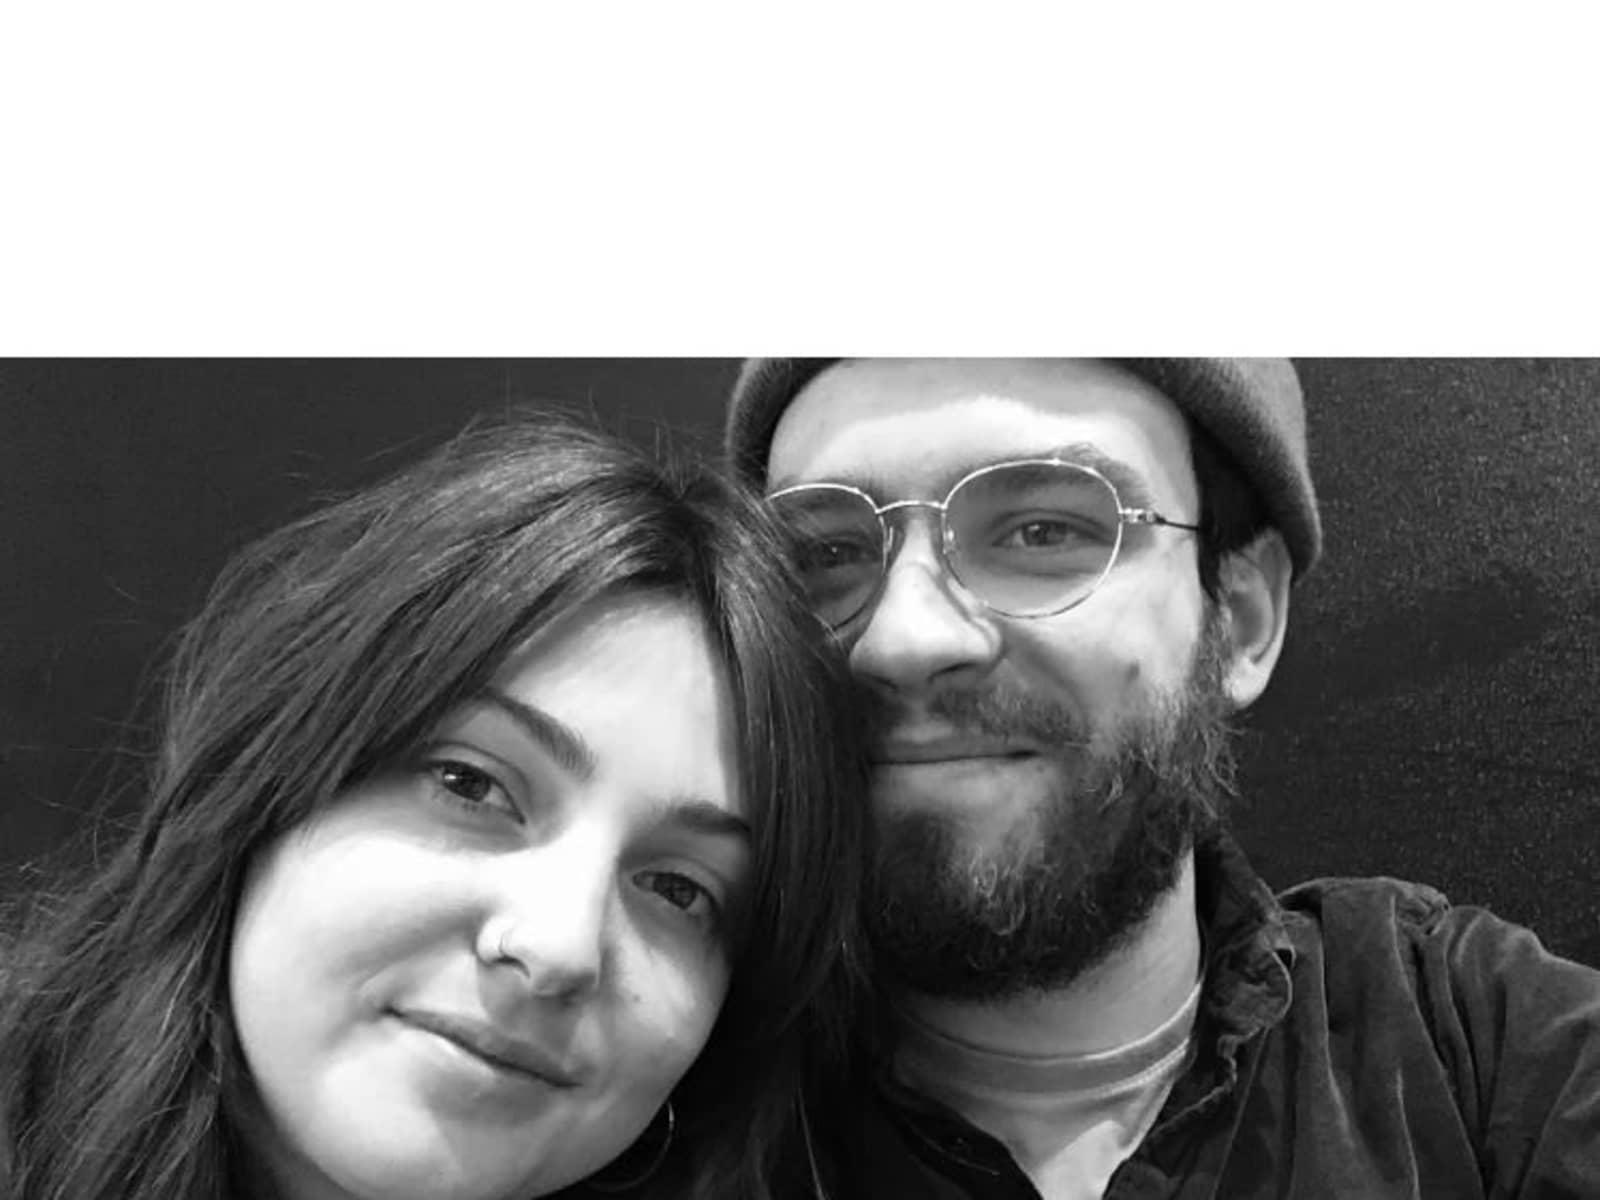 Scarlett & Angus from New York City, New York, United States